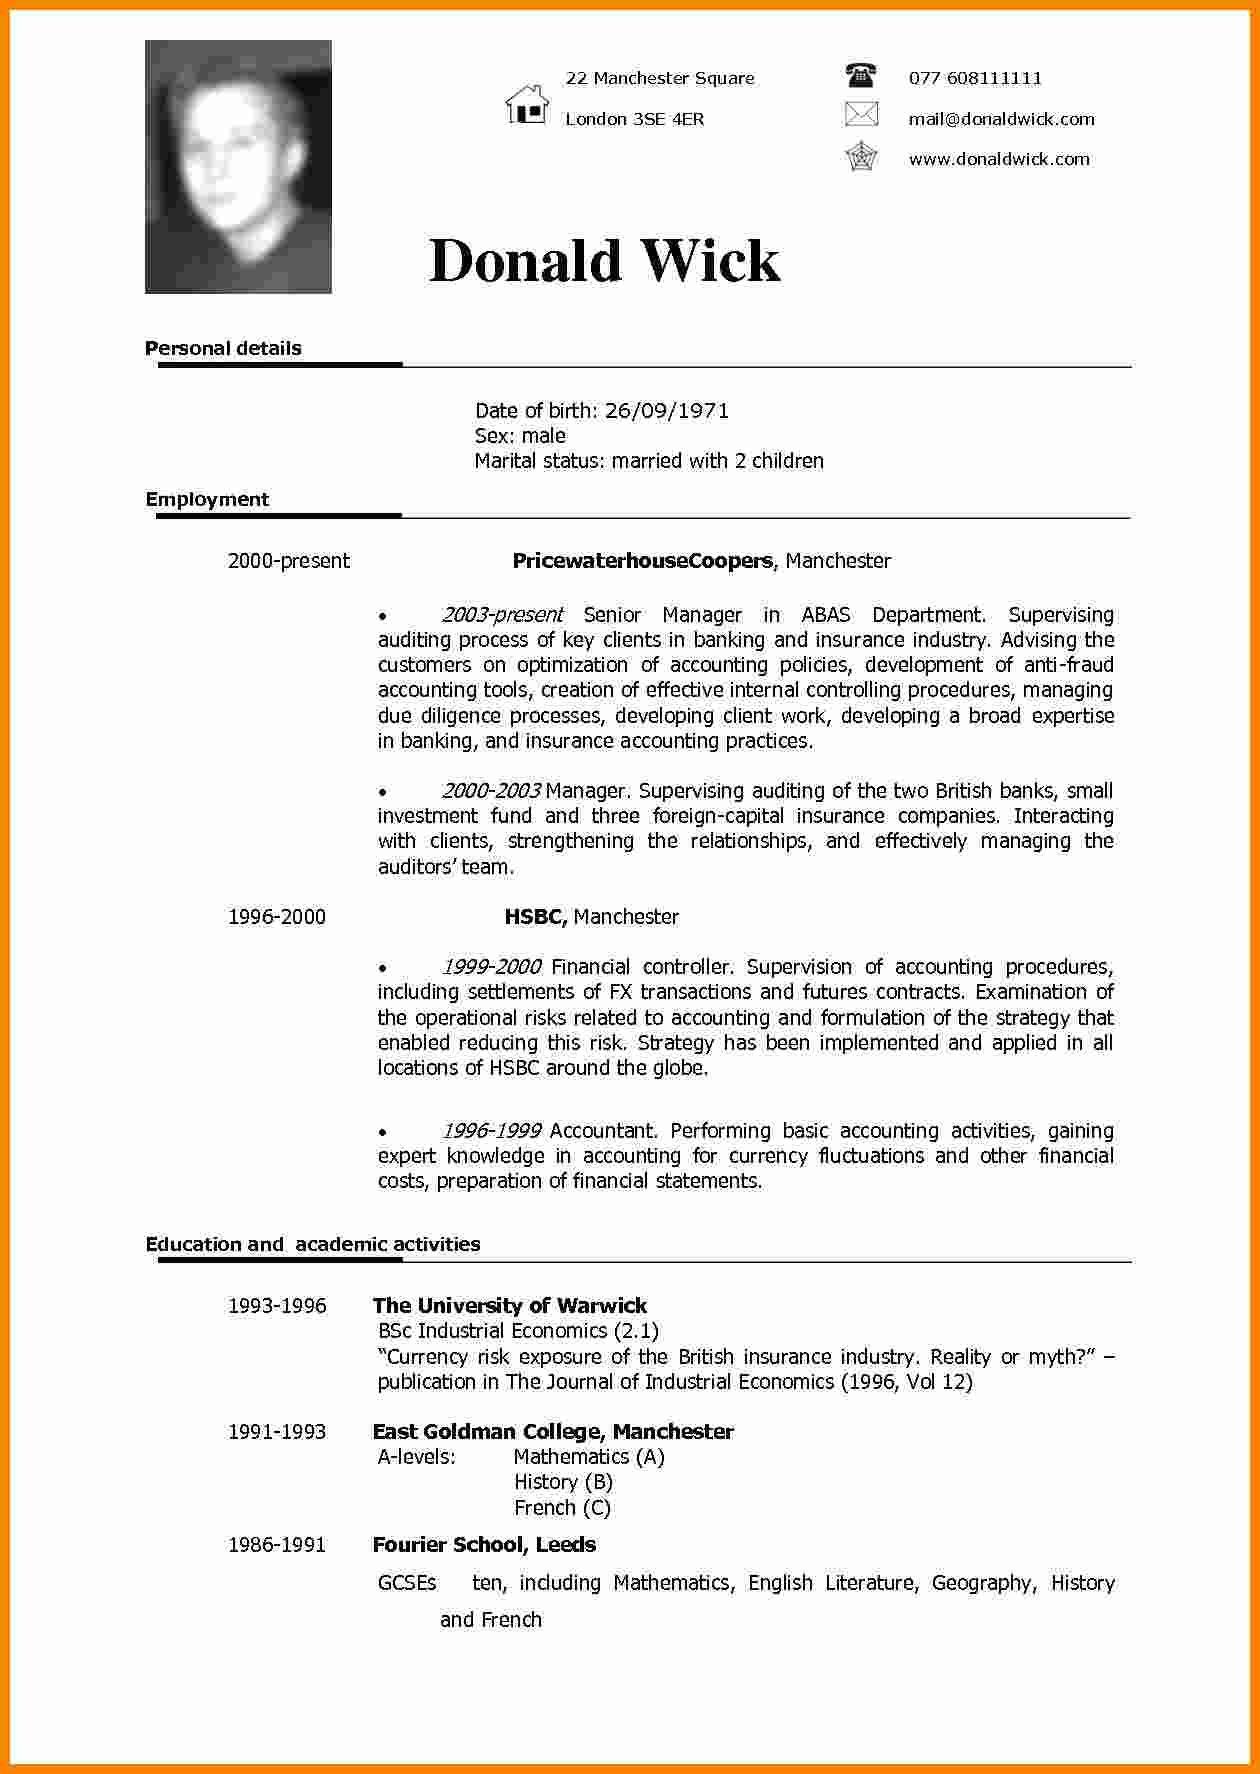 5 cv sample in english theorynpractice Amazing 5 cv